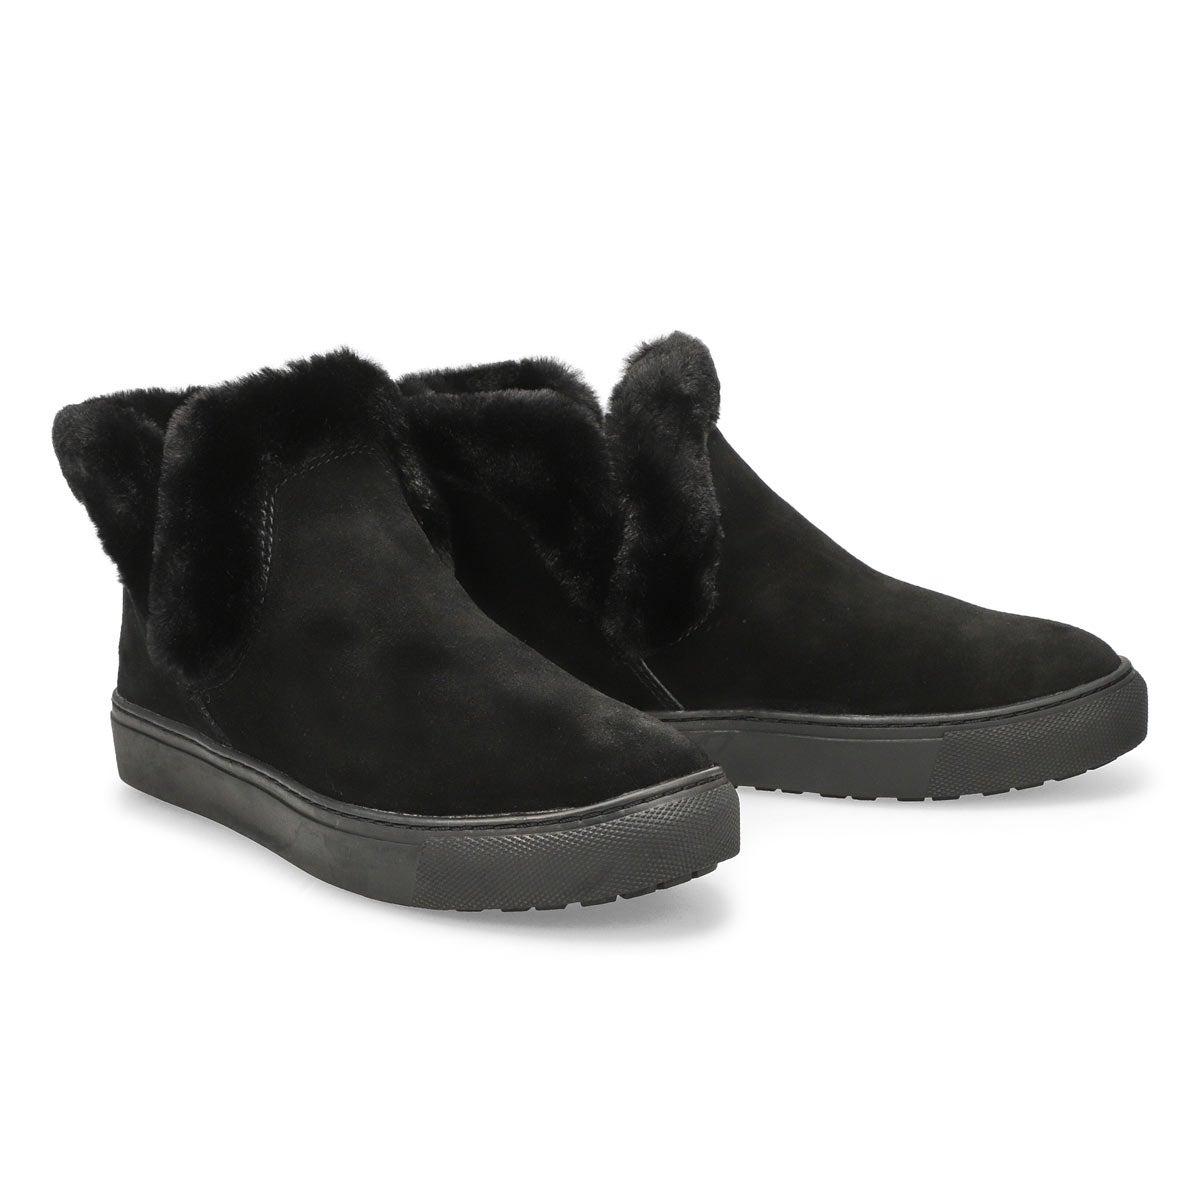 Women's DUFFY black winter booties